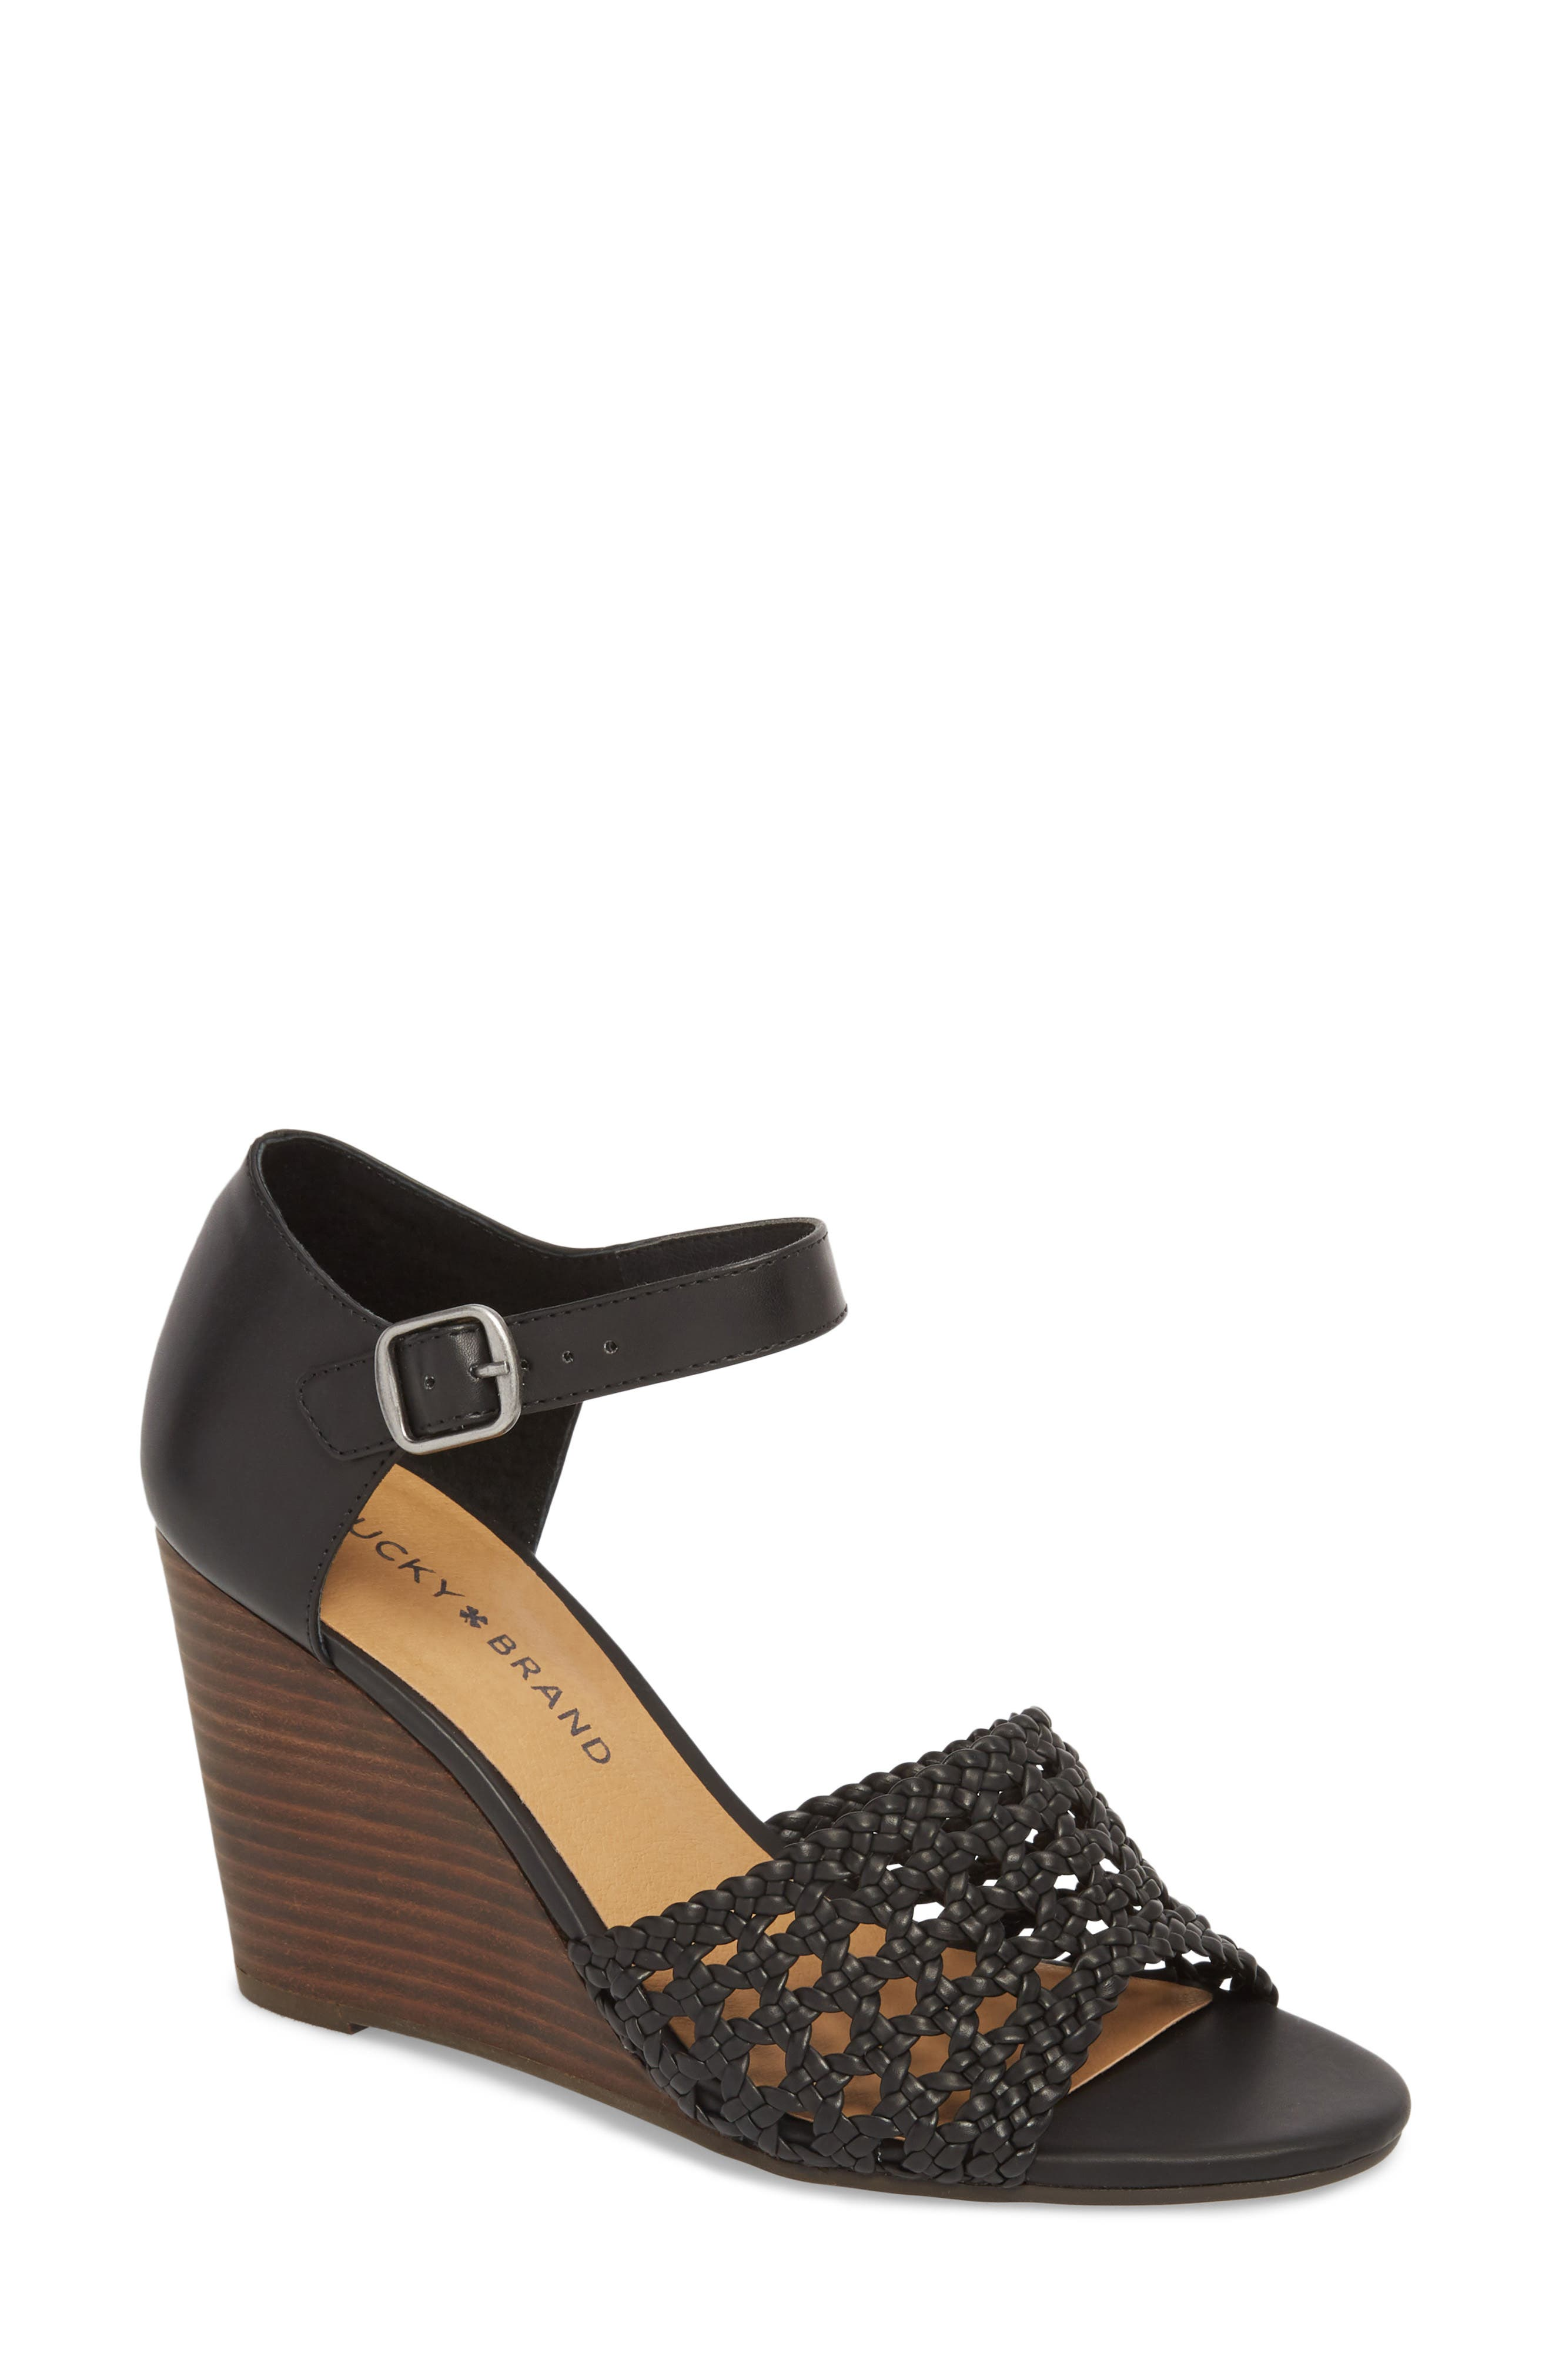 Rabekka Wedge Sandal,                         Main,                         color,